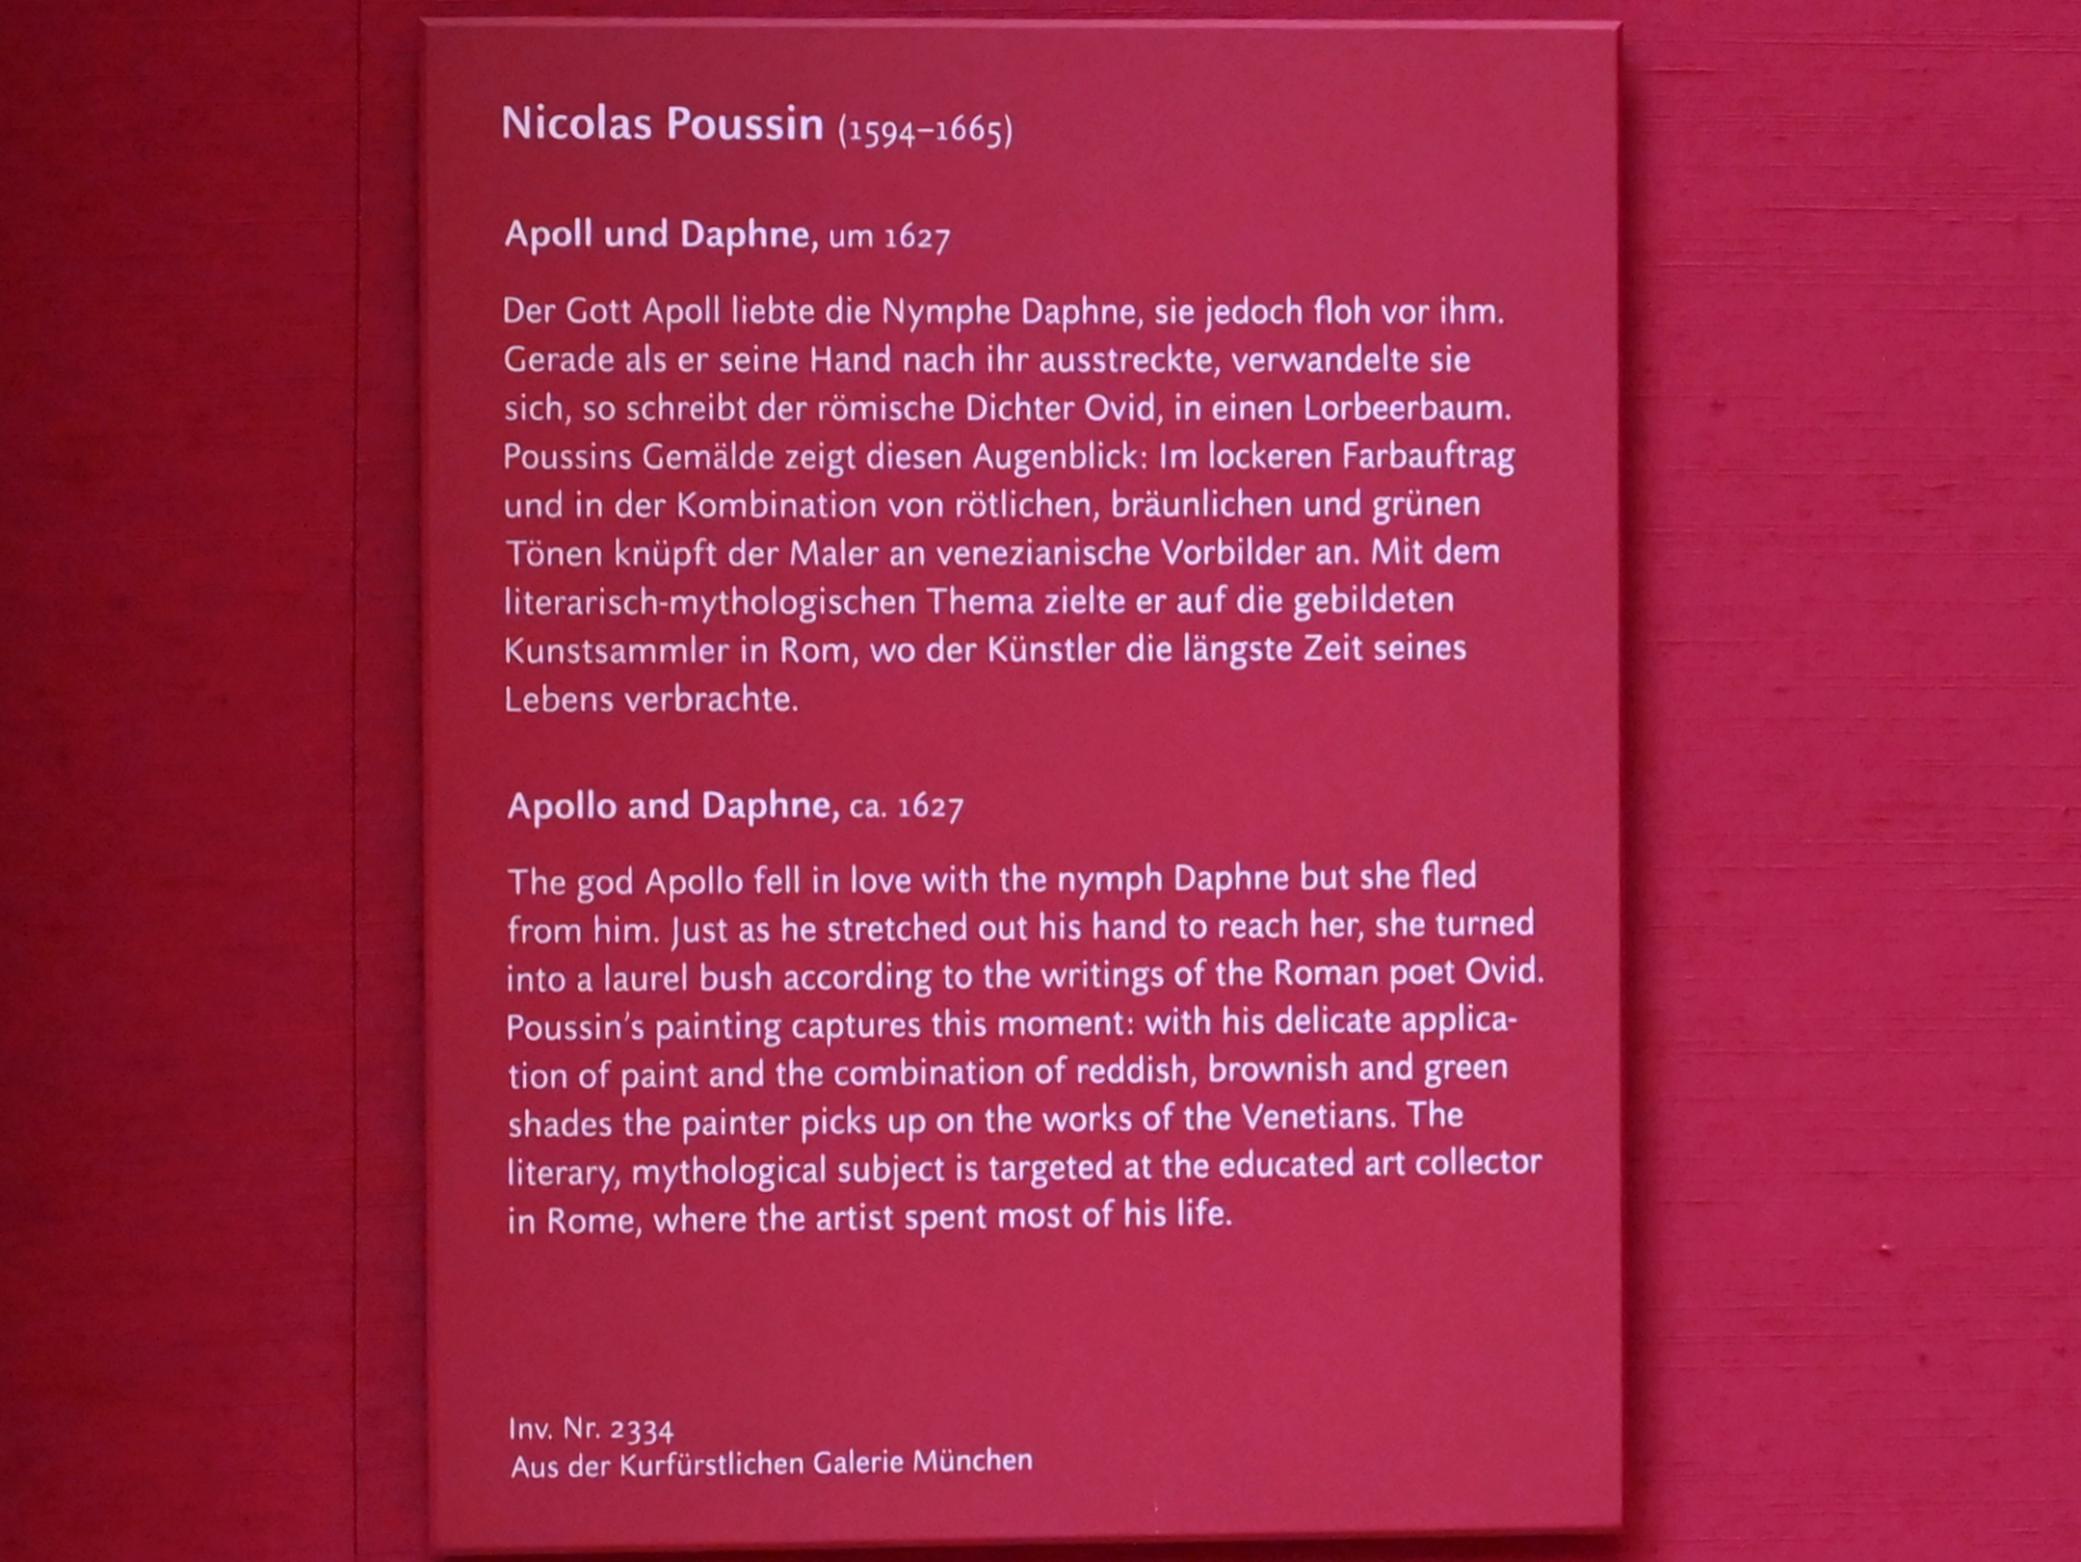 Nicolas Poussin: Apoll und Daphne, Um 1627